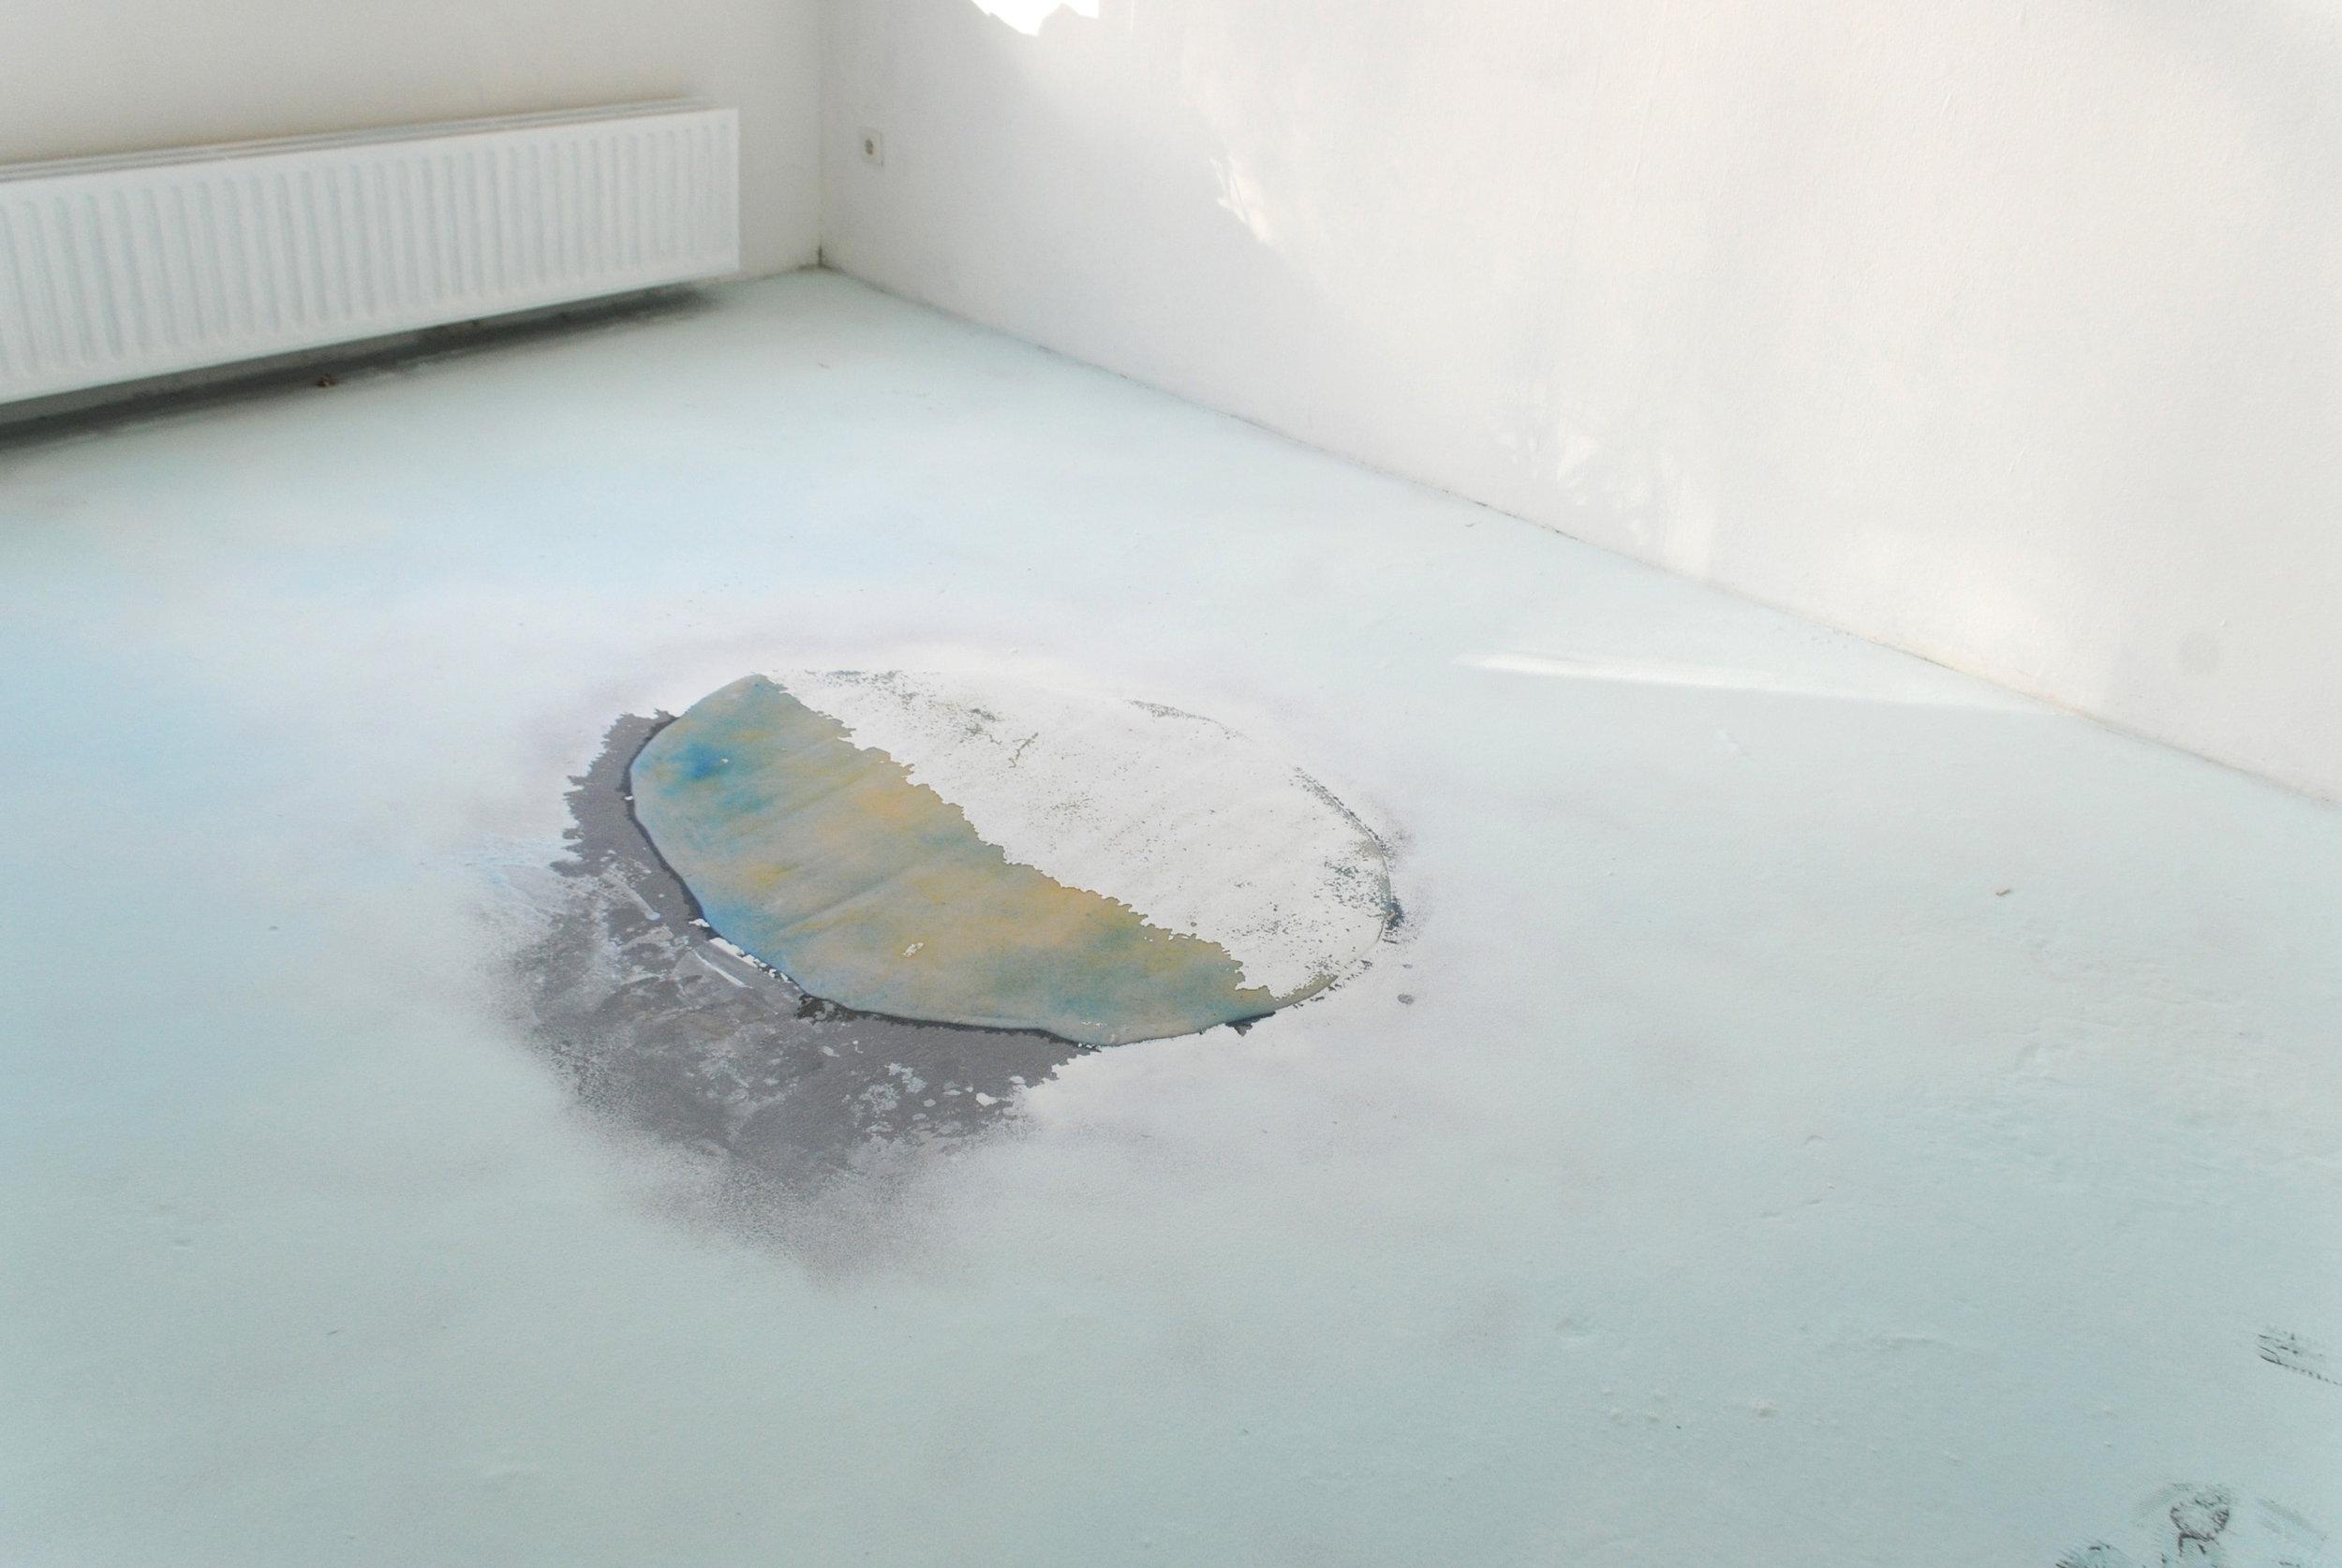 Soap-powder - Soap, fluor, pigments, 400 x 300 cm, De hemel bevolken, Kunstpodium T, Tilburg, 2014